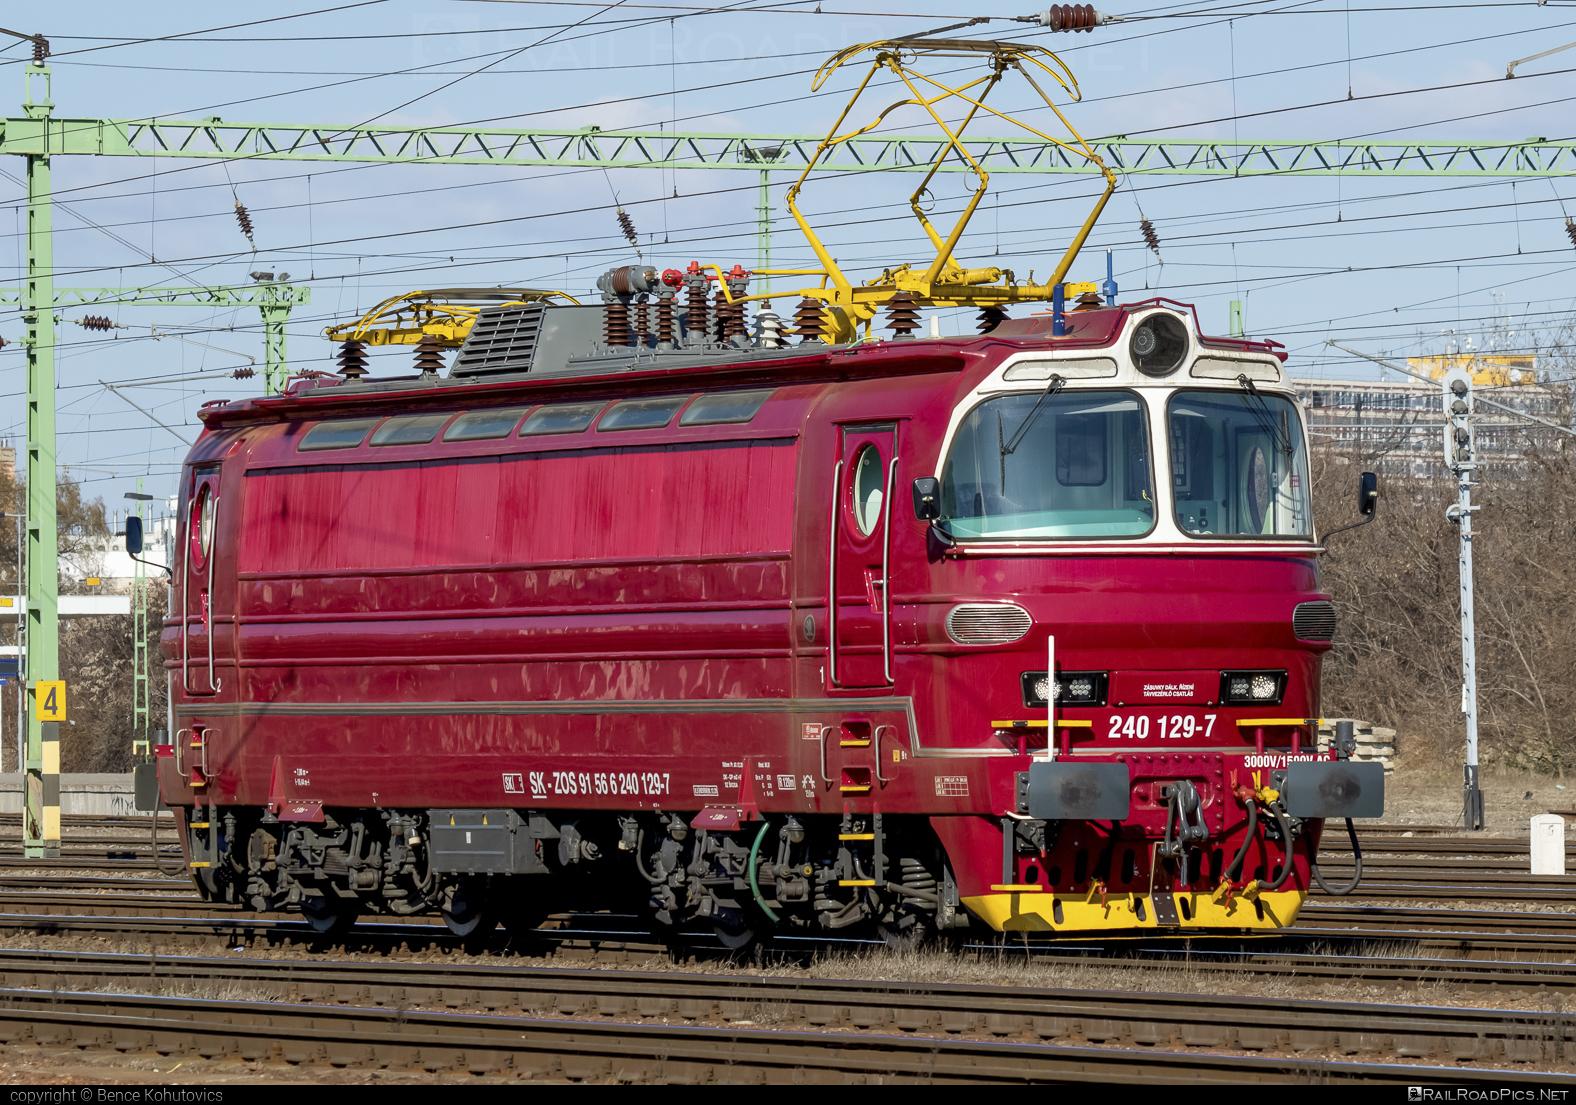 Škoda 47E - 240 129-7 operated by ZOS ZVOLEN s.r.o. #laminatka #locomotive240 #skoda #skoda47e #zos #zoszvolen